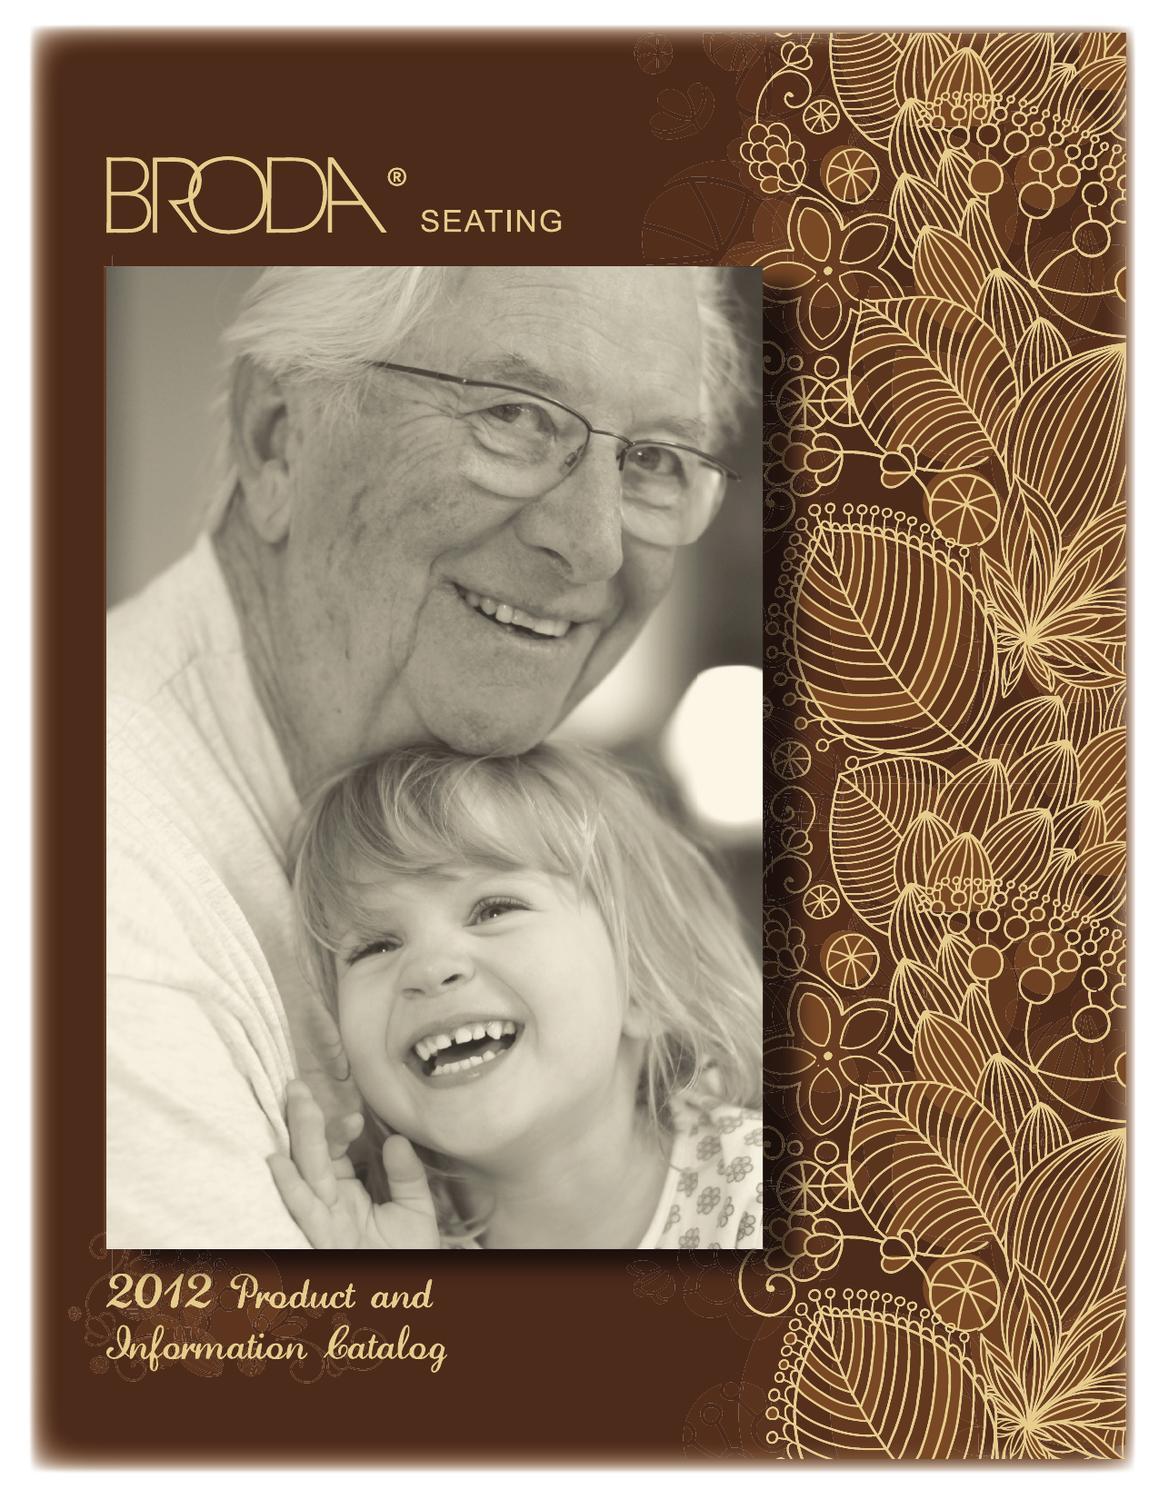 2012 Broda Catalog By Holly Weyand Issuu